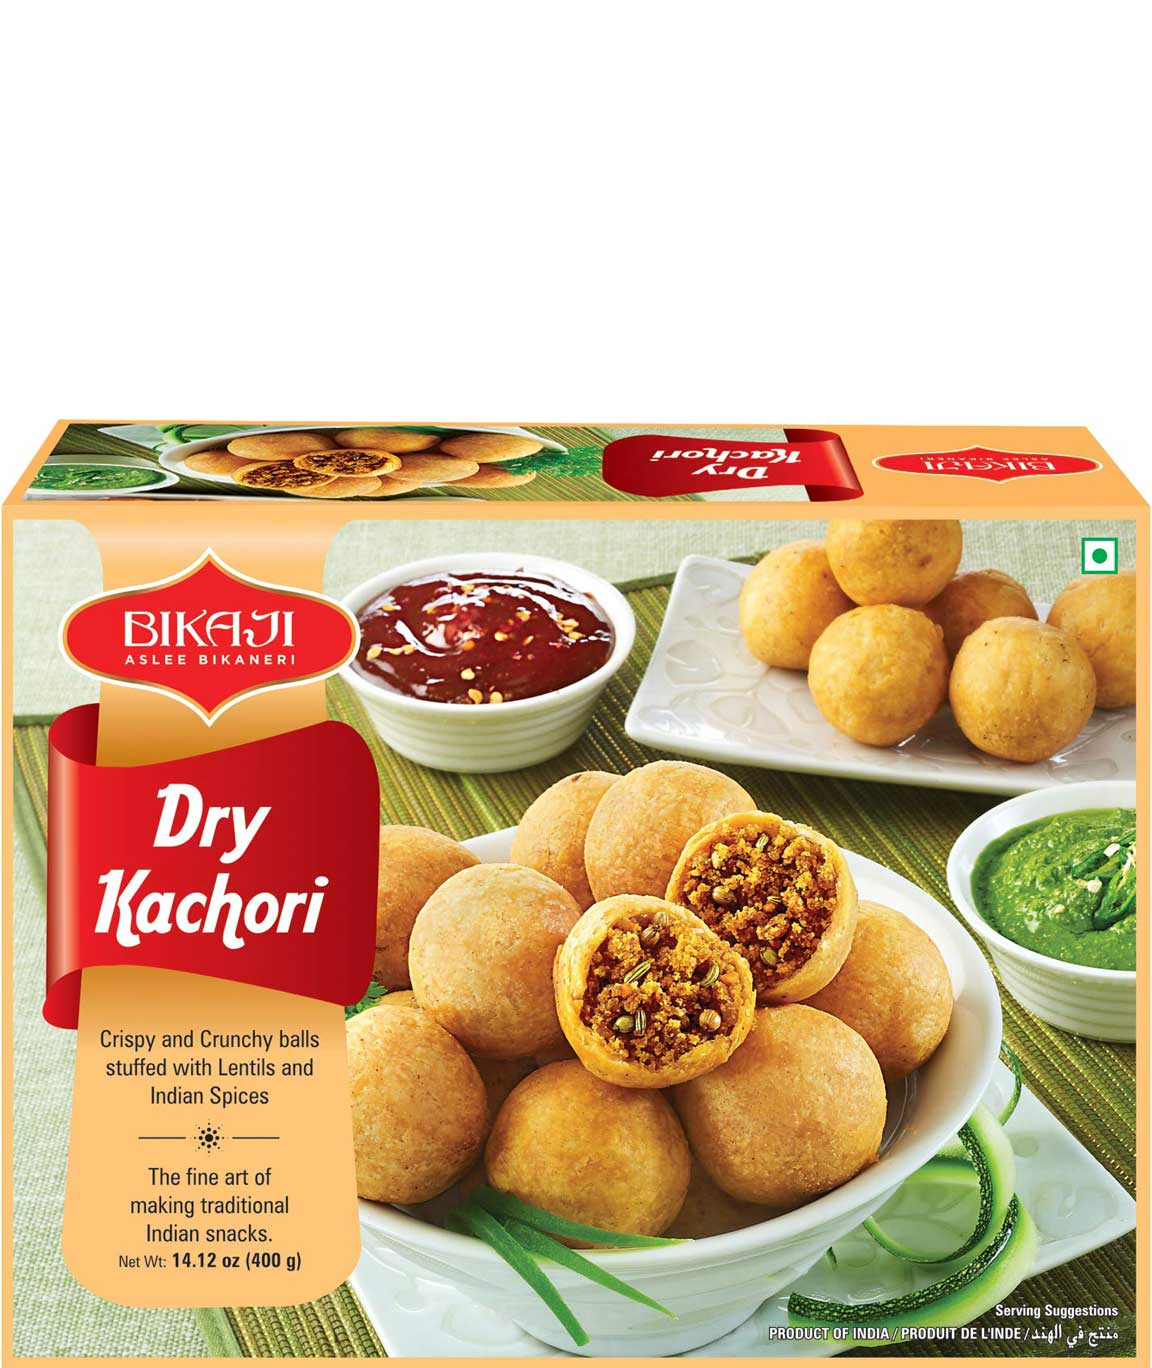 Bikaji Aslee Bikaneri - Dry Kachori 400g - 100% Vegetarian - Indian Namkeen Snack - Pack of 5